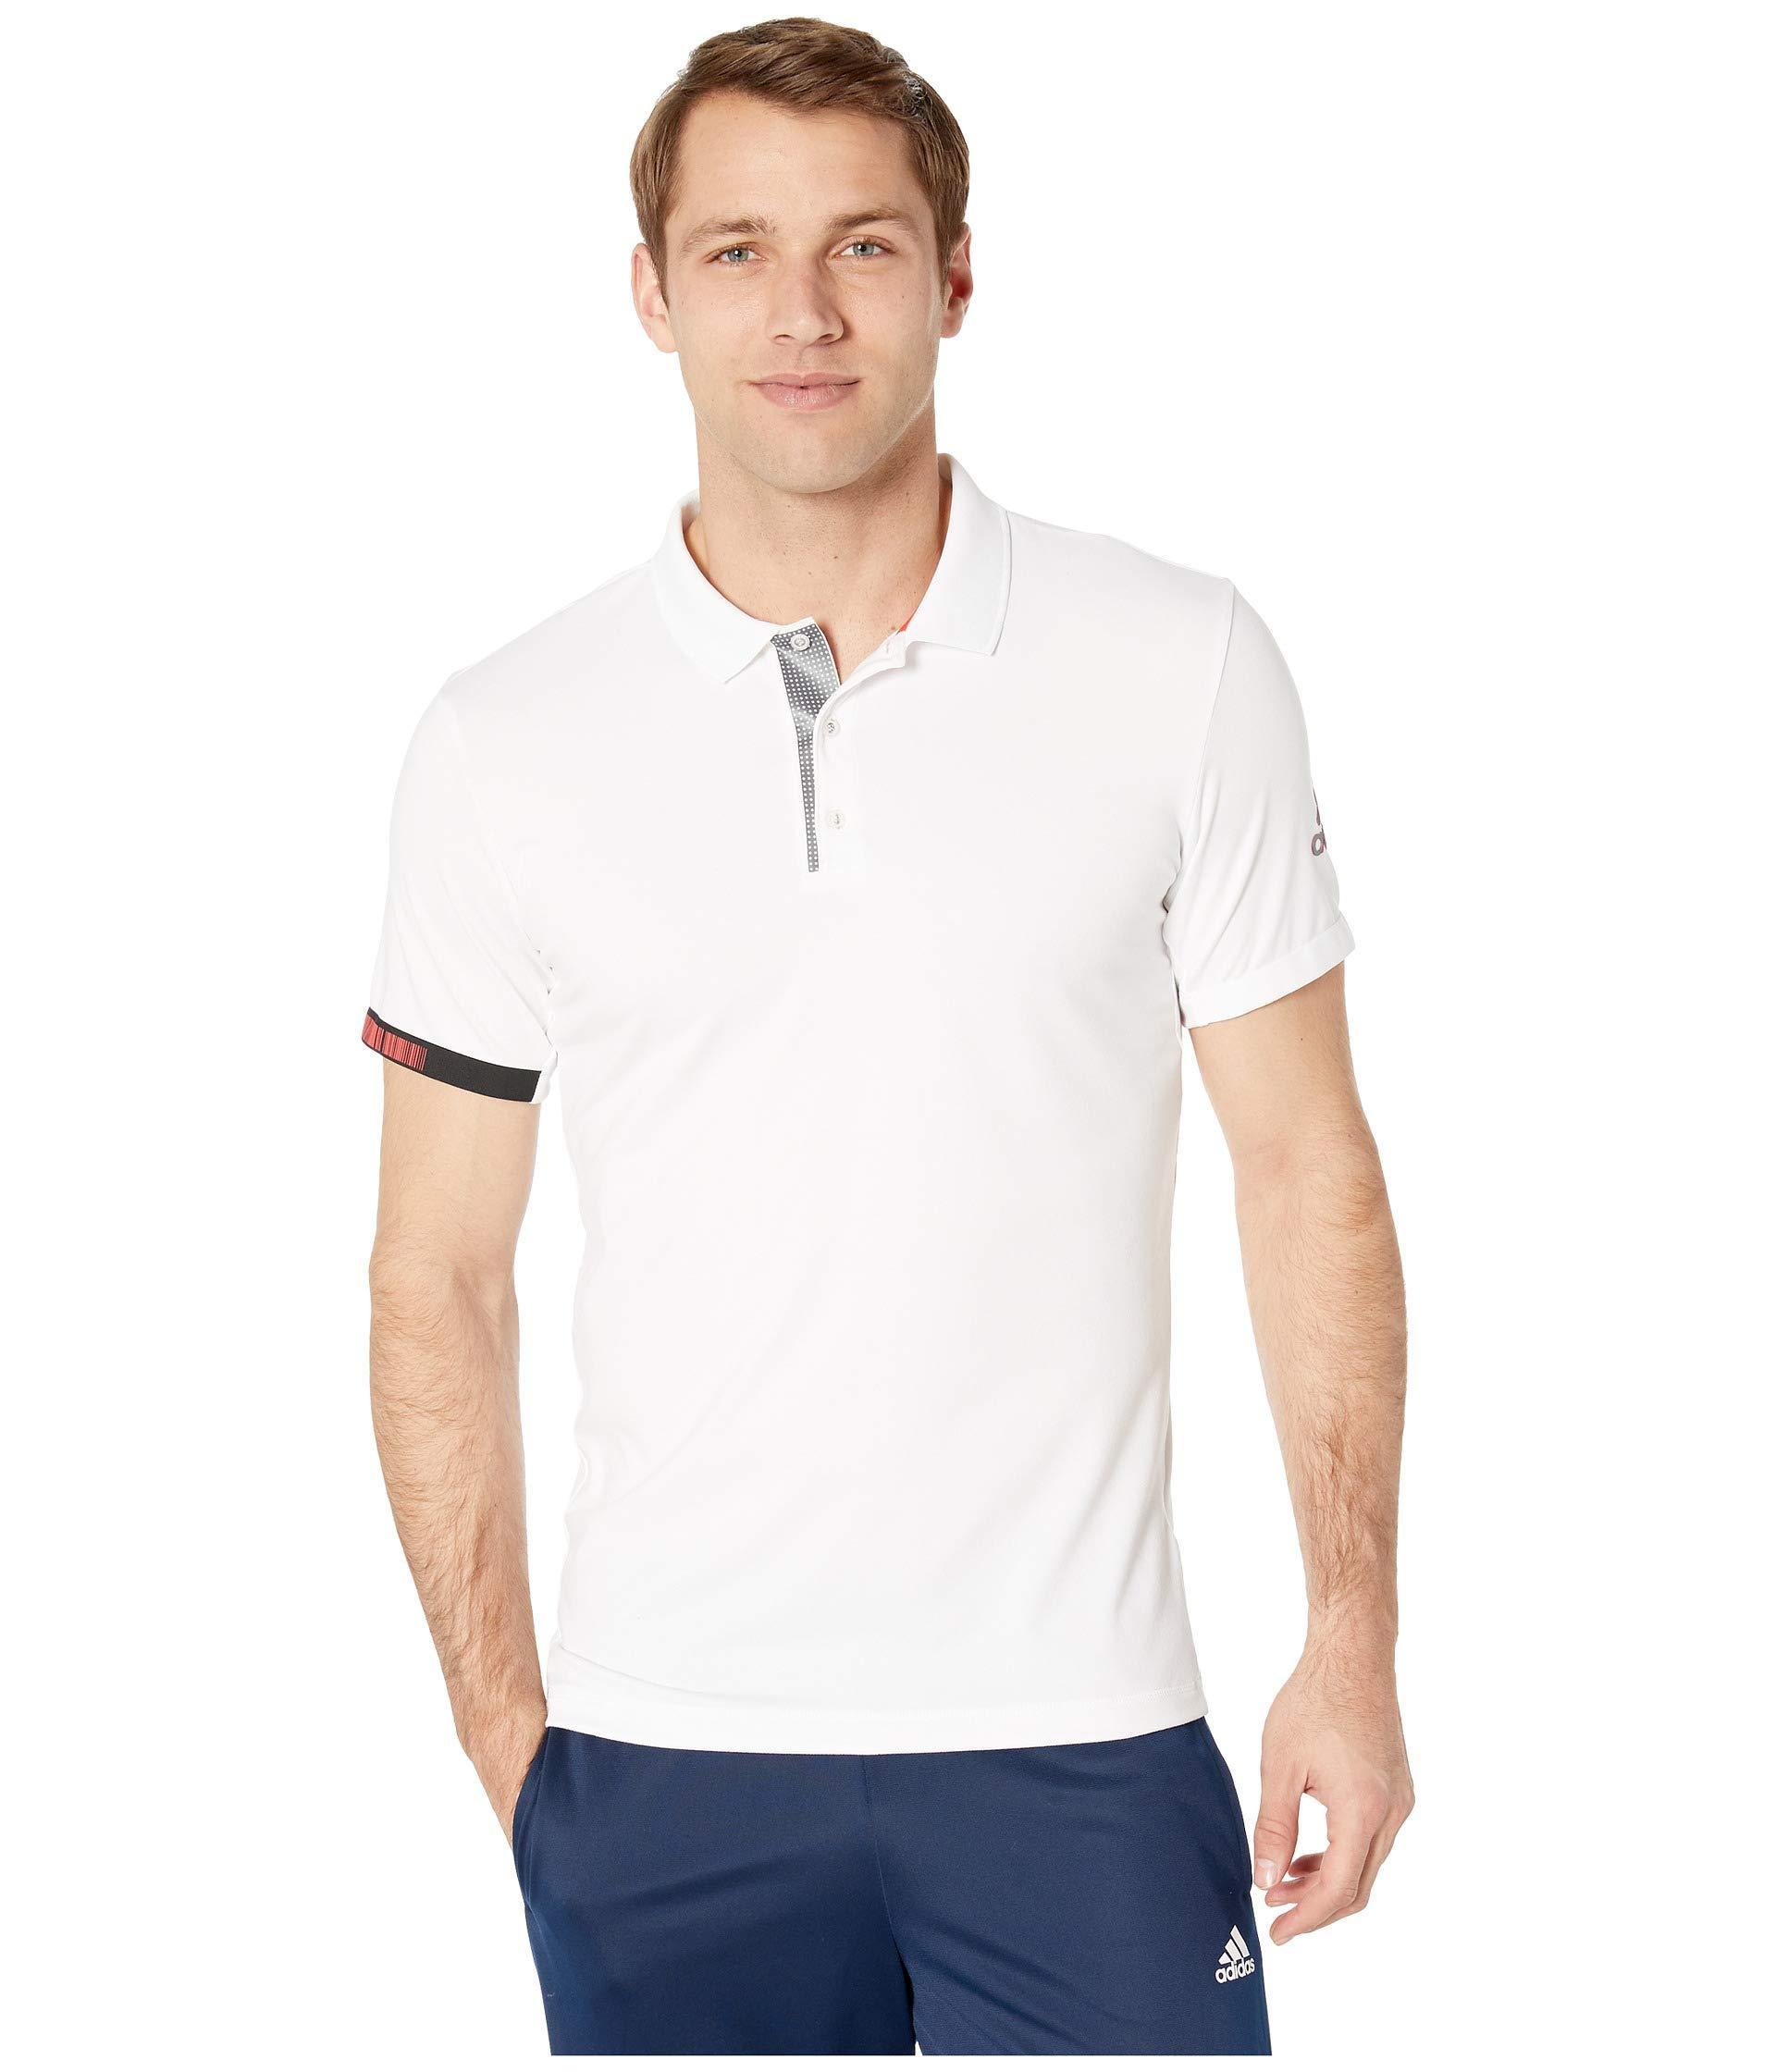 Lyst - adidas Matchcode Polo (white night Metallic) Men s T Shirt in ... b596d8161594c